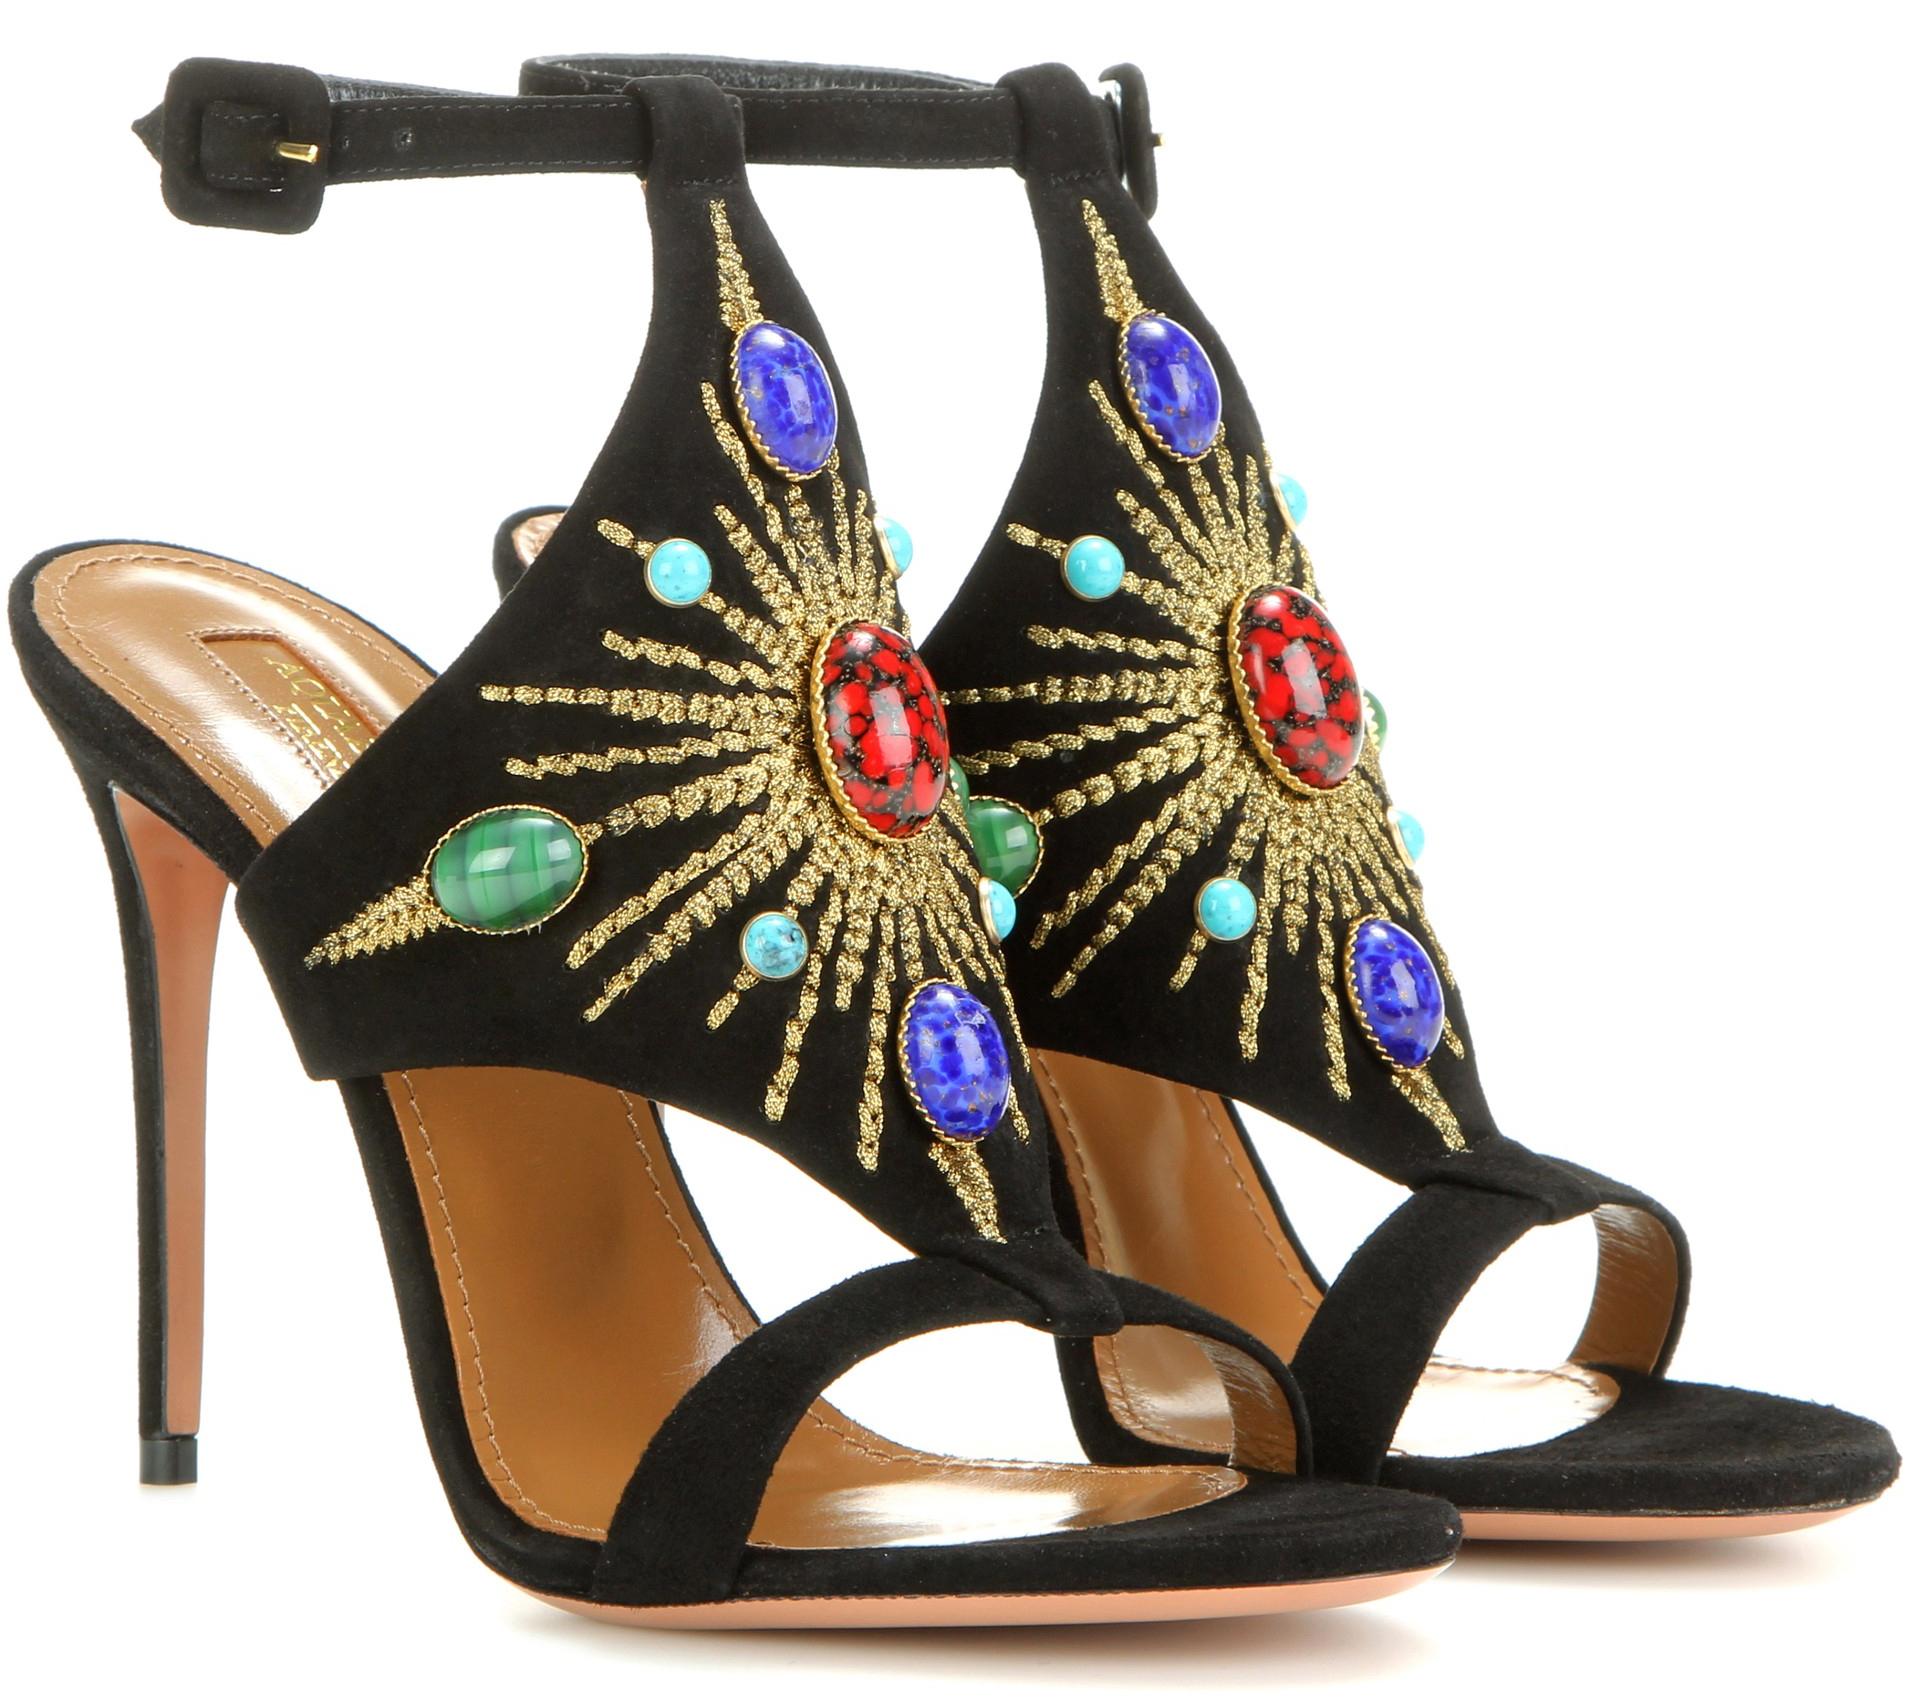 Aquazzura Desert Sun 105 embellished suede sandals